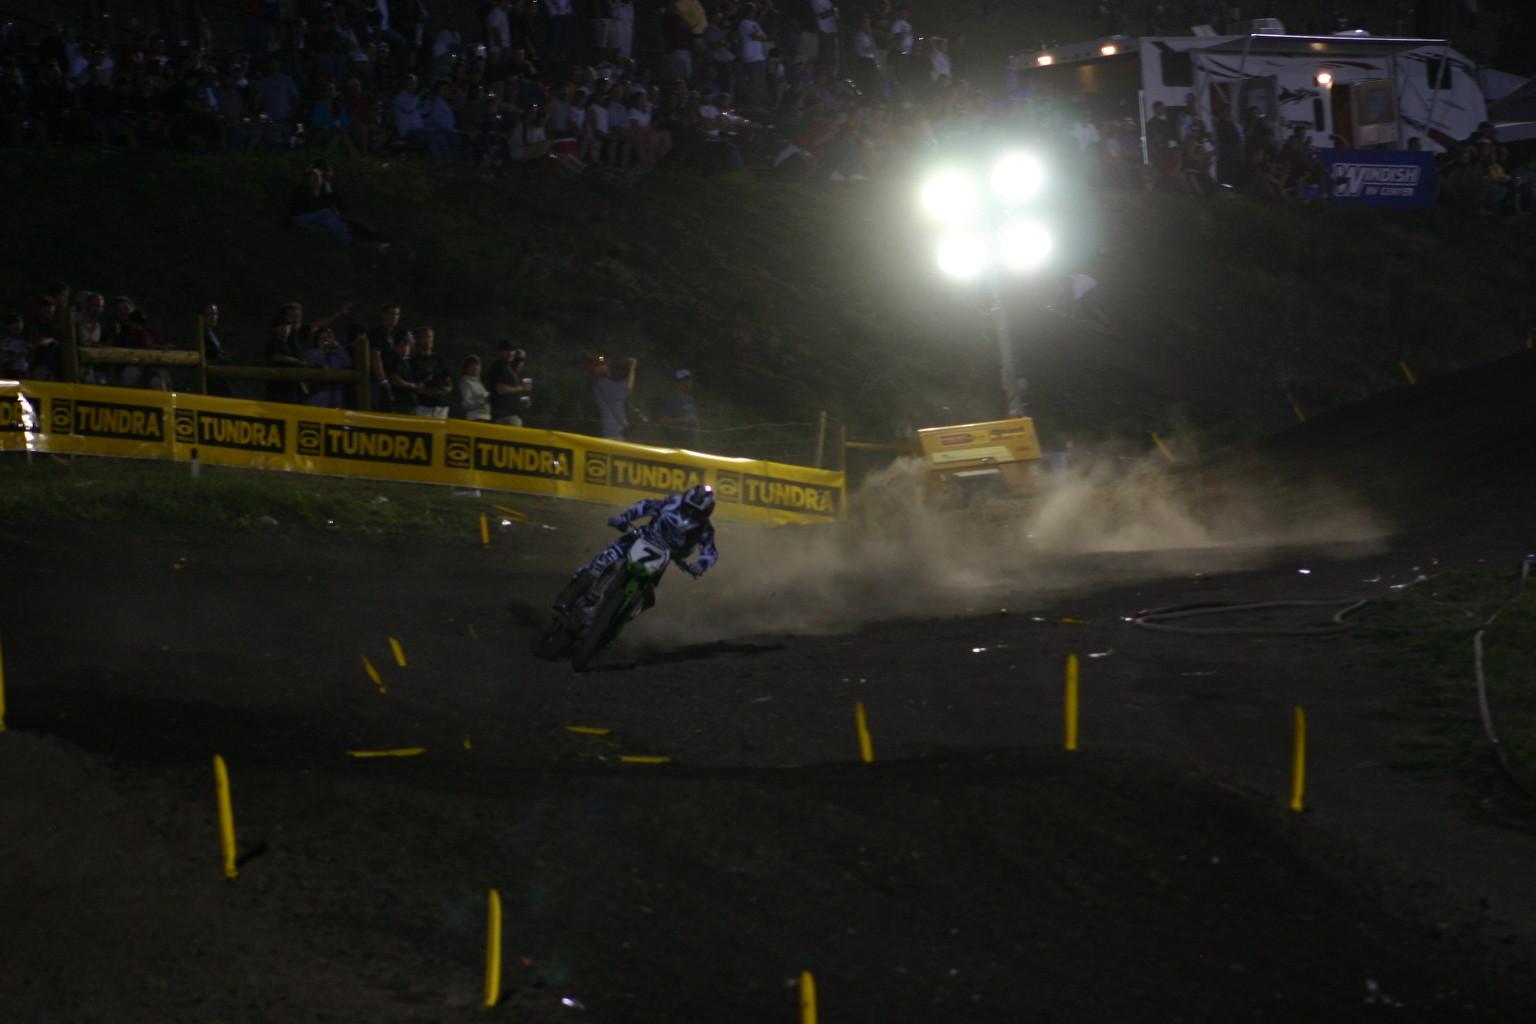 Stew at night - jtomasik - Motocross Pictures - Vital MX